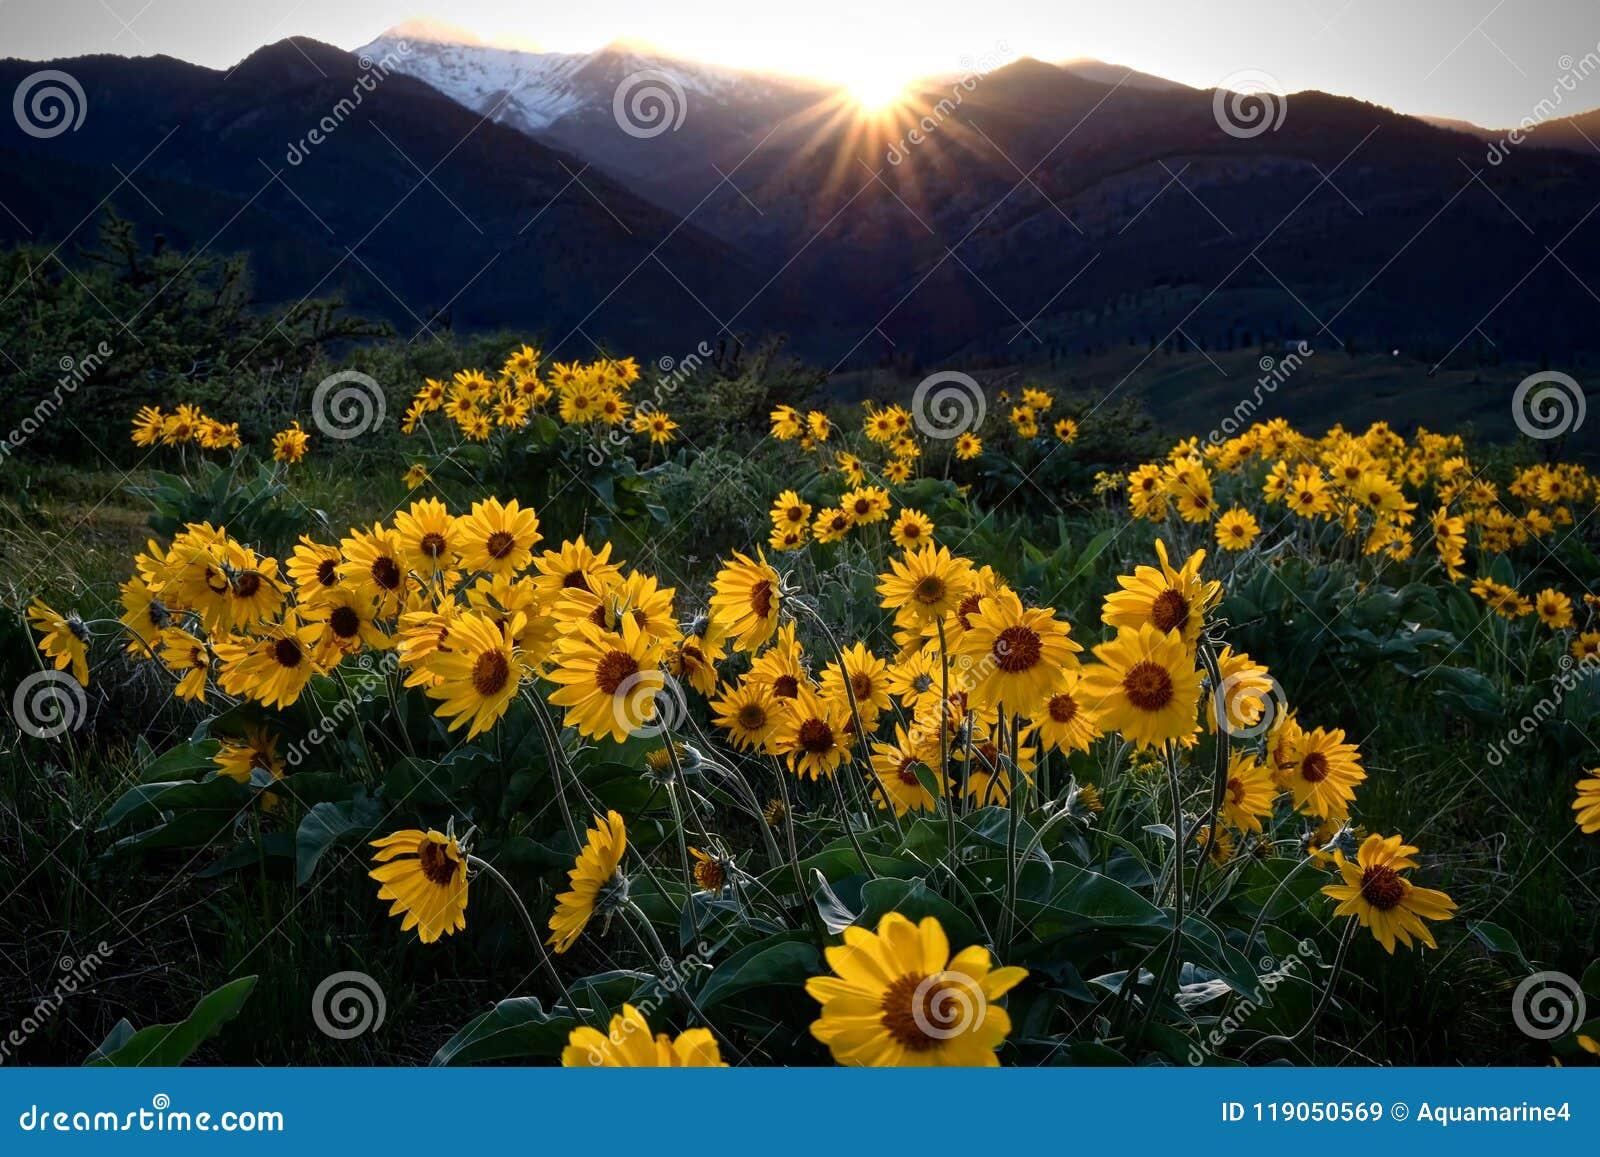 Arnica meadows at sunrise beautiful sunflowers in the morning download arnica meadows at sunrise beautiful sunflowers in the morning stock image image izmirmasajfo